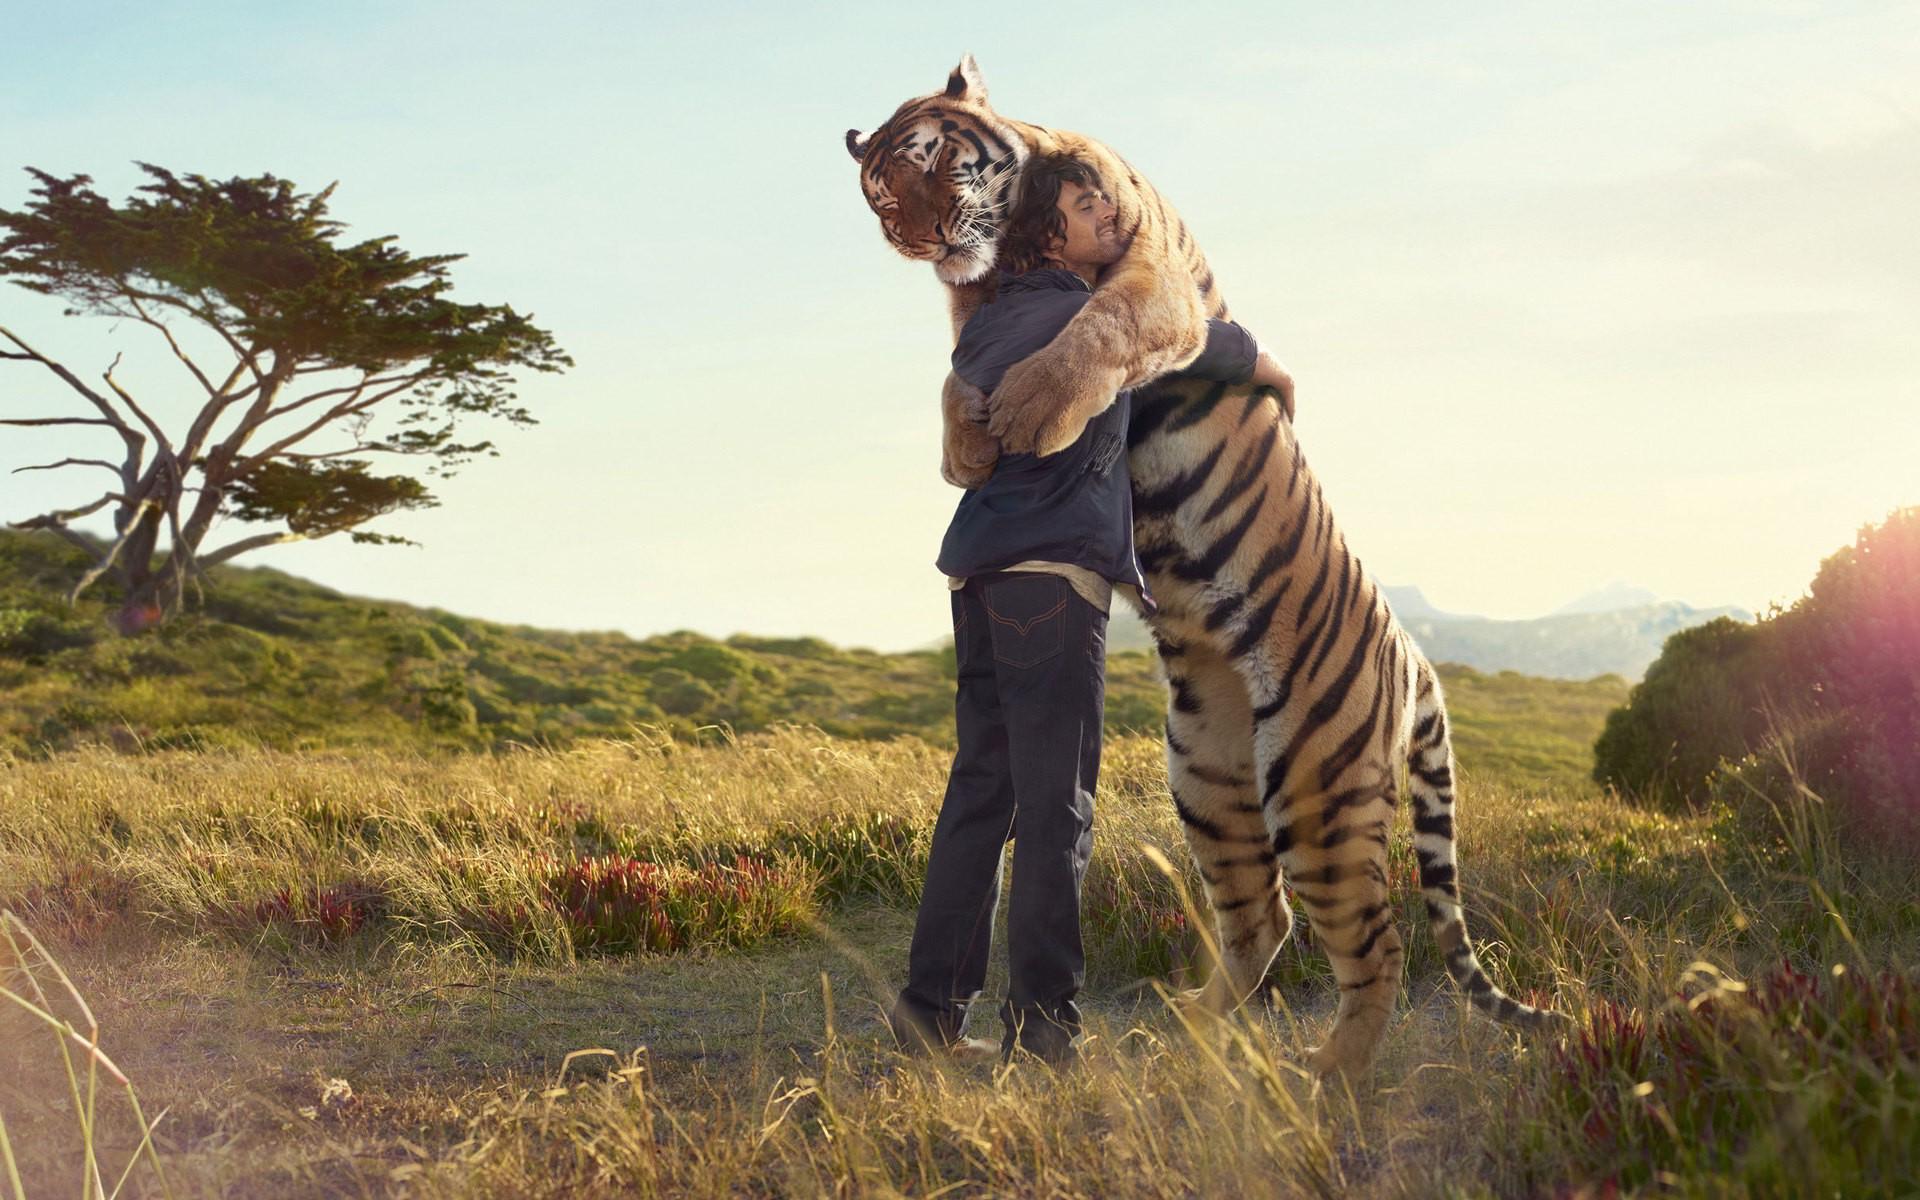 Man tiger hug